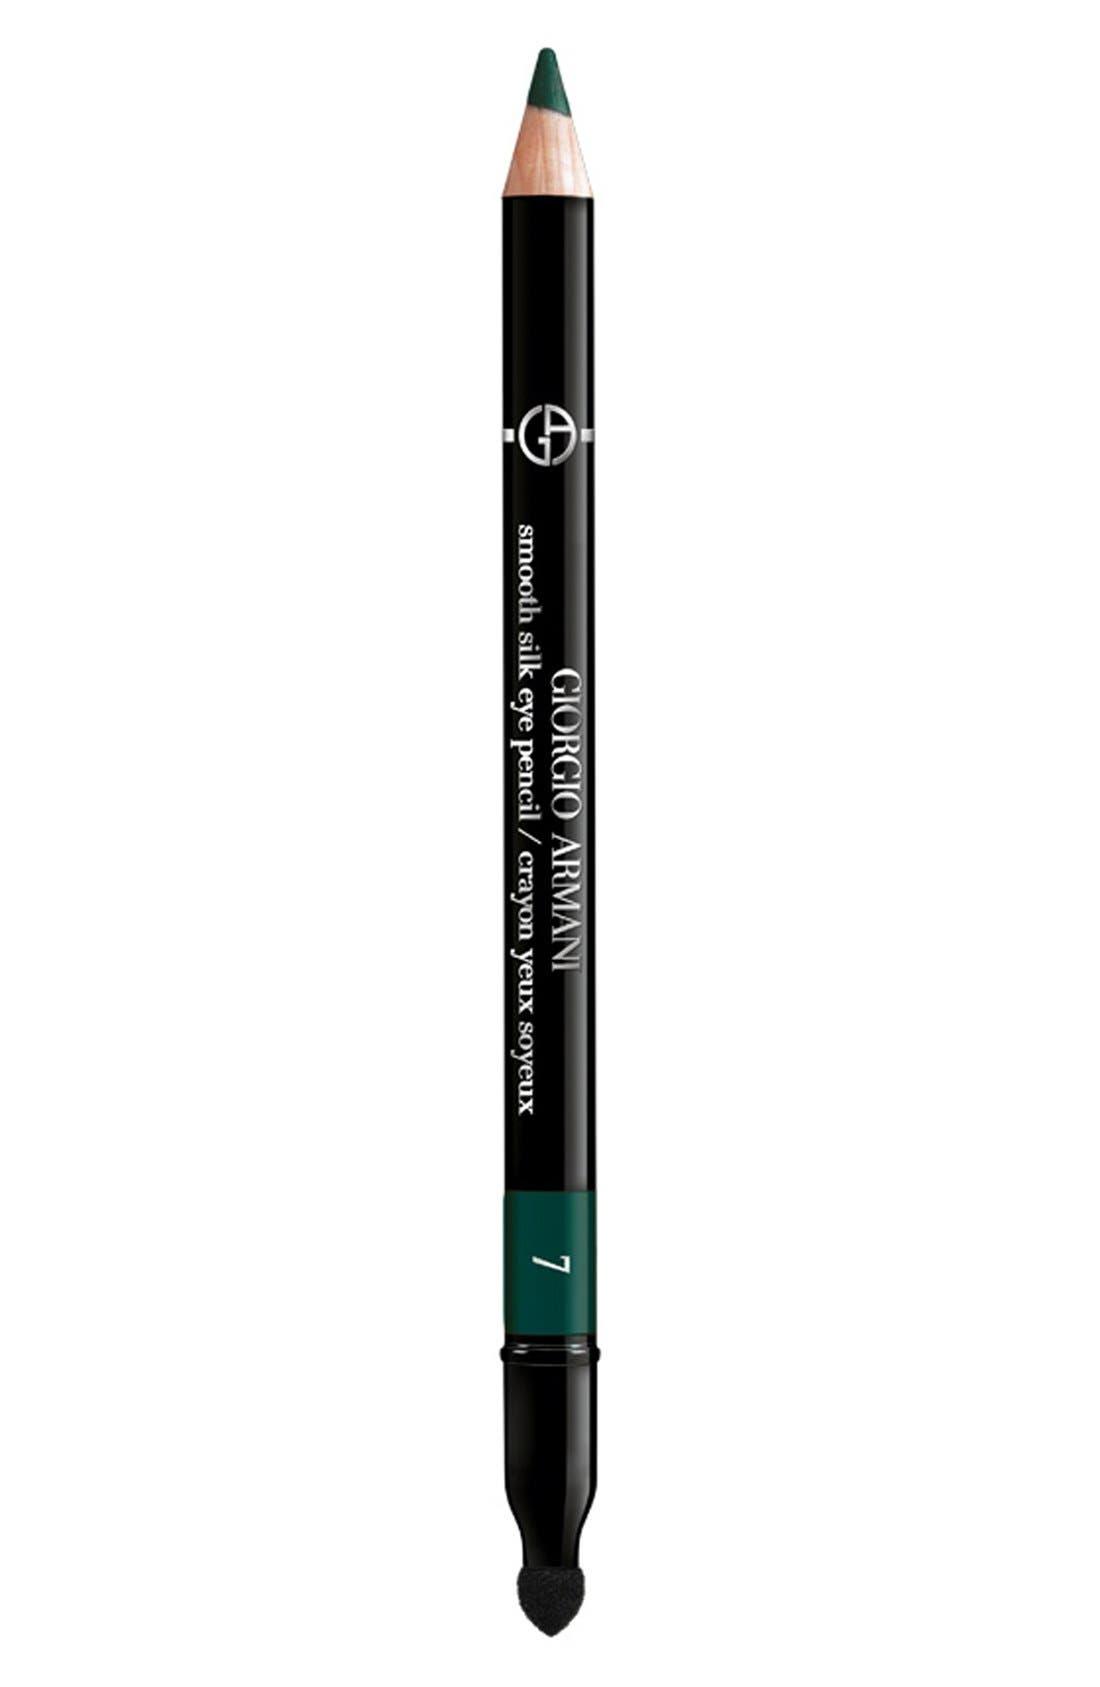 Giorgio Armani 'Smooth Silk' Eye Pencil